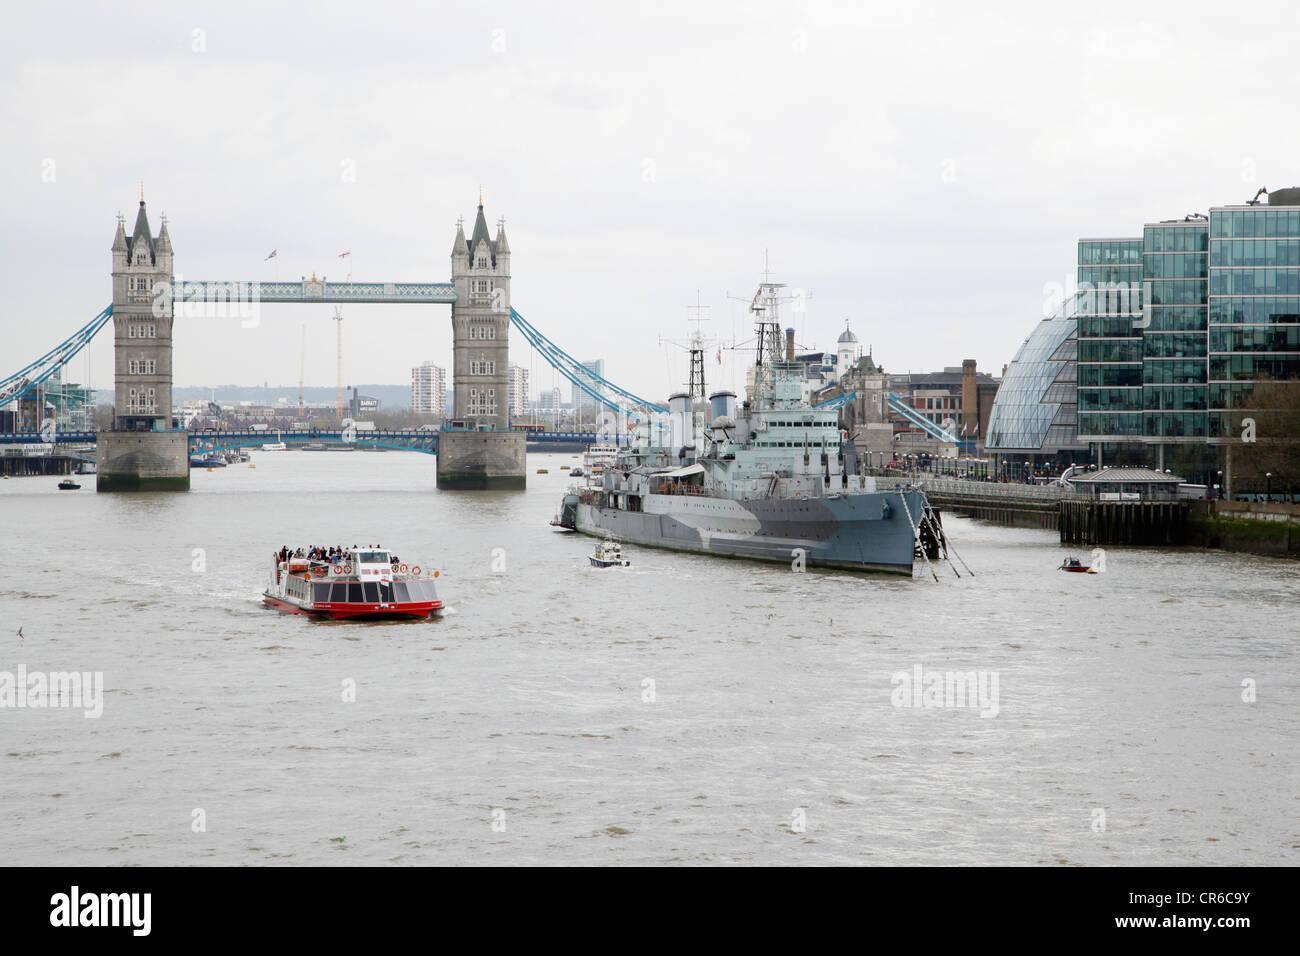 England, London, View of London bridge and navy ship - Stock Image